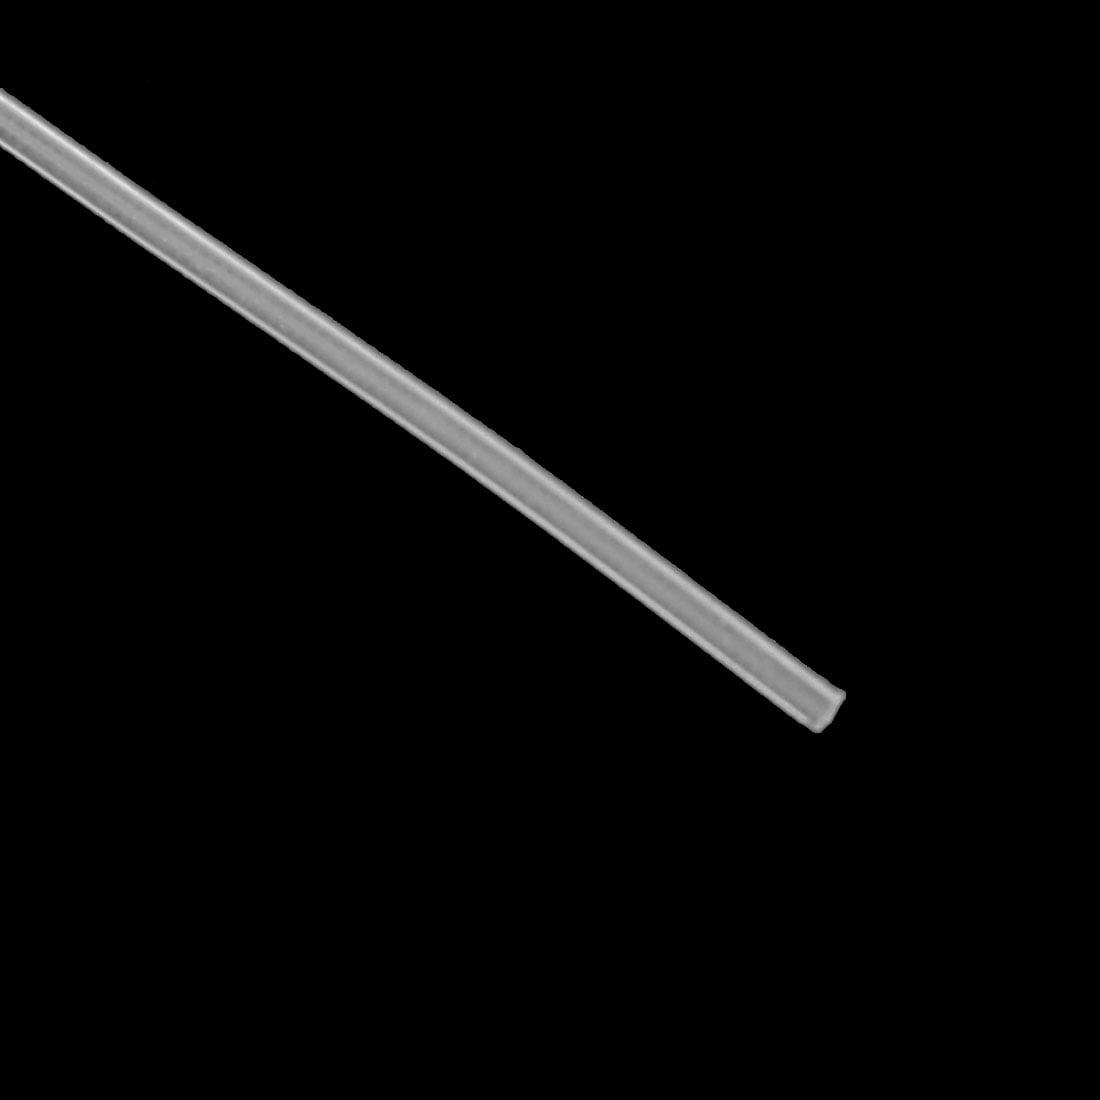 Household Office Plastic Rubber Lens Acetate Eye Wire Interliner Clear 2 PCS - image 1 de 2